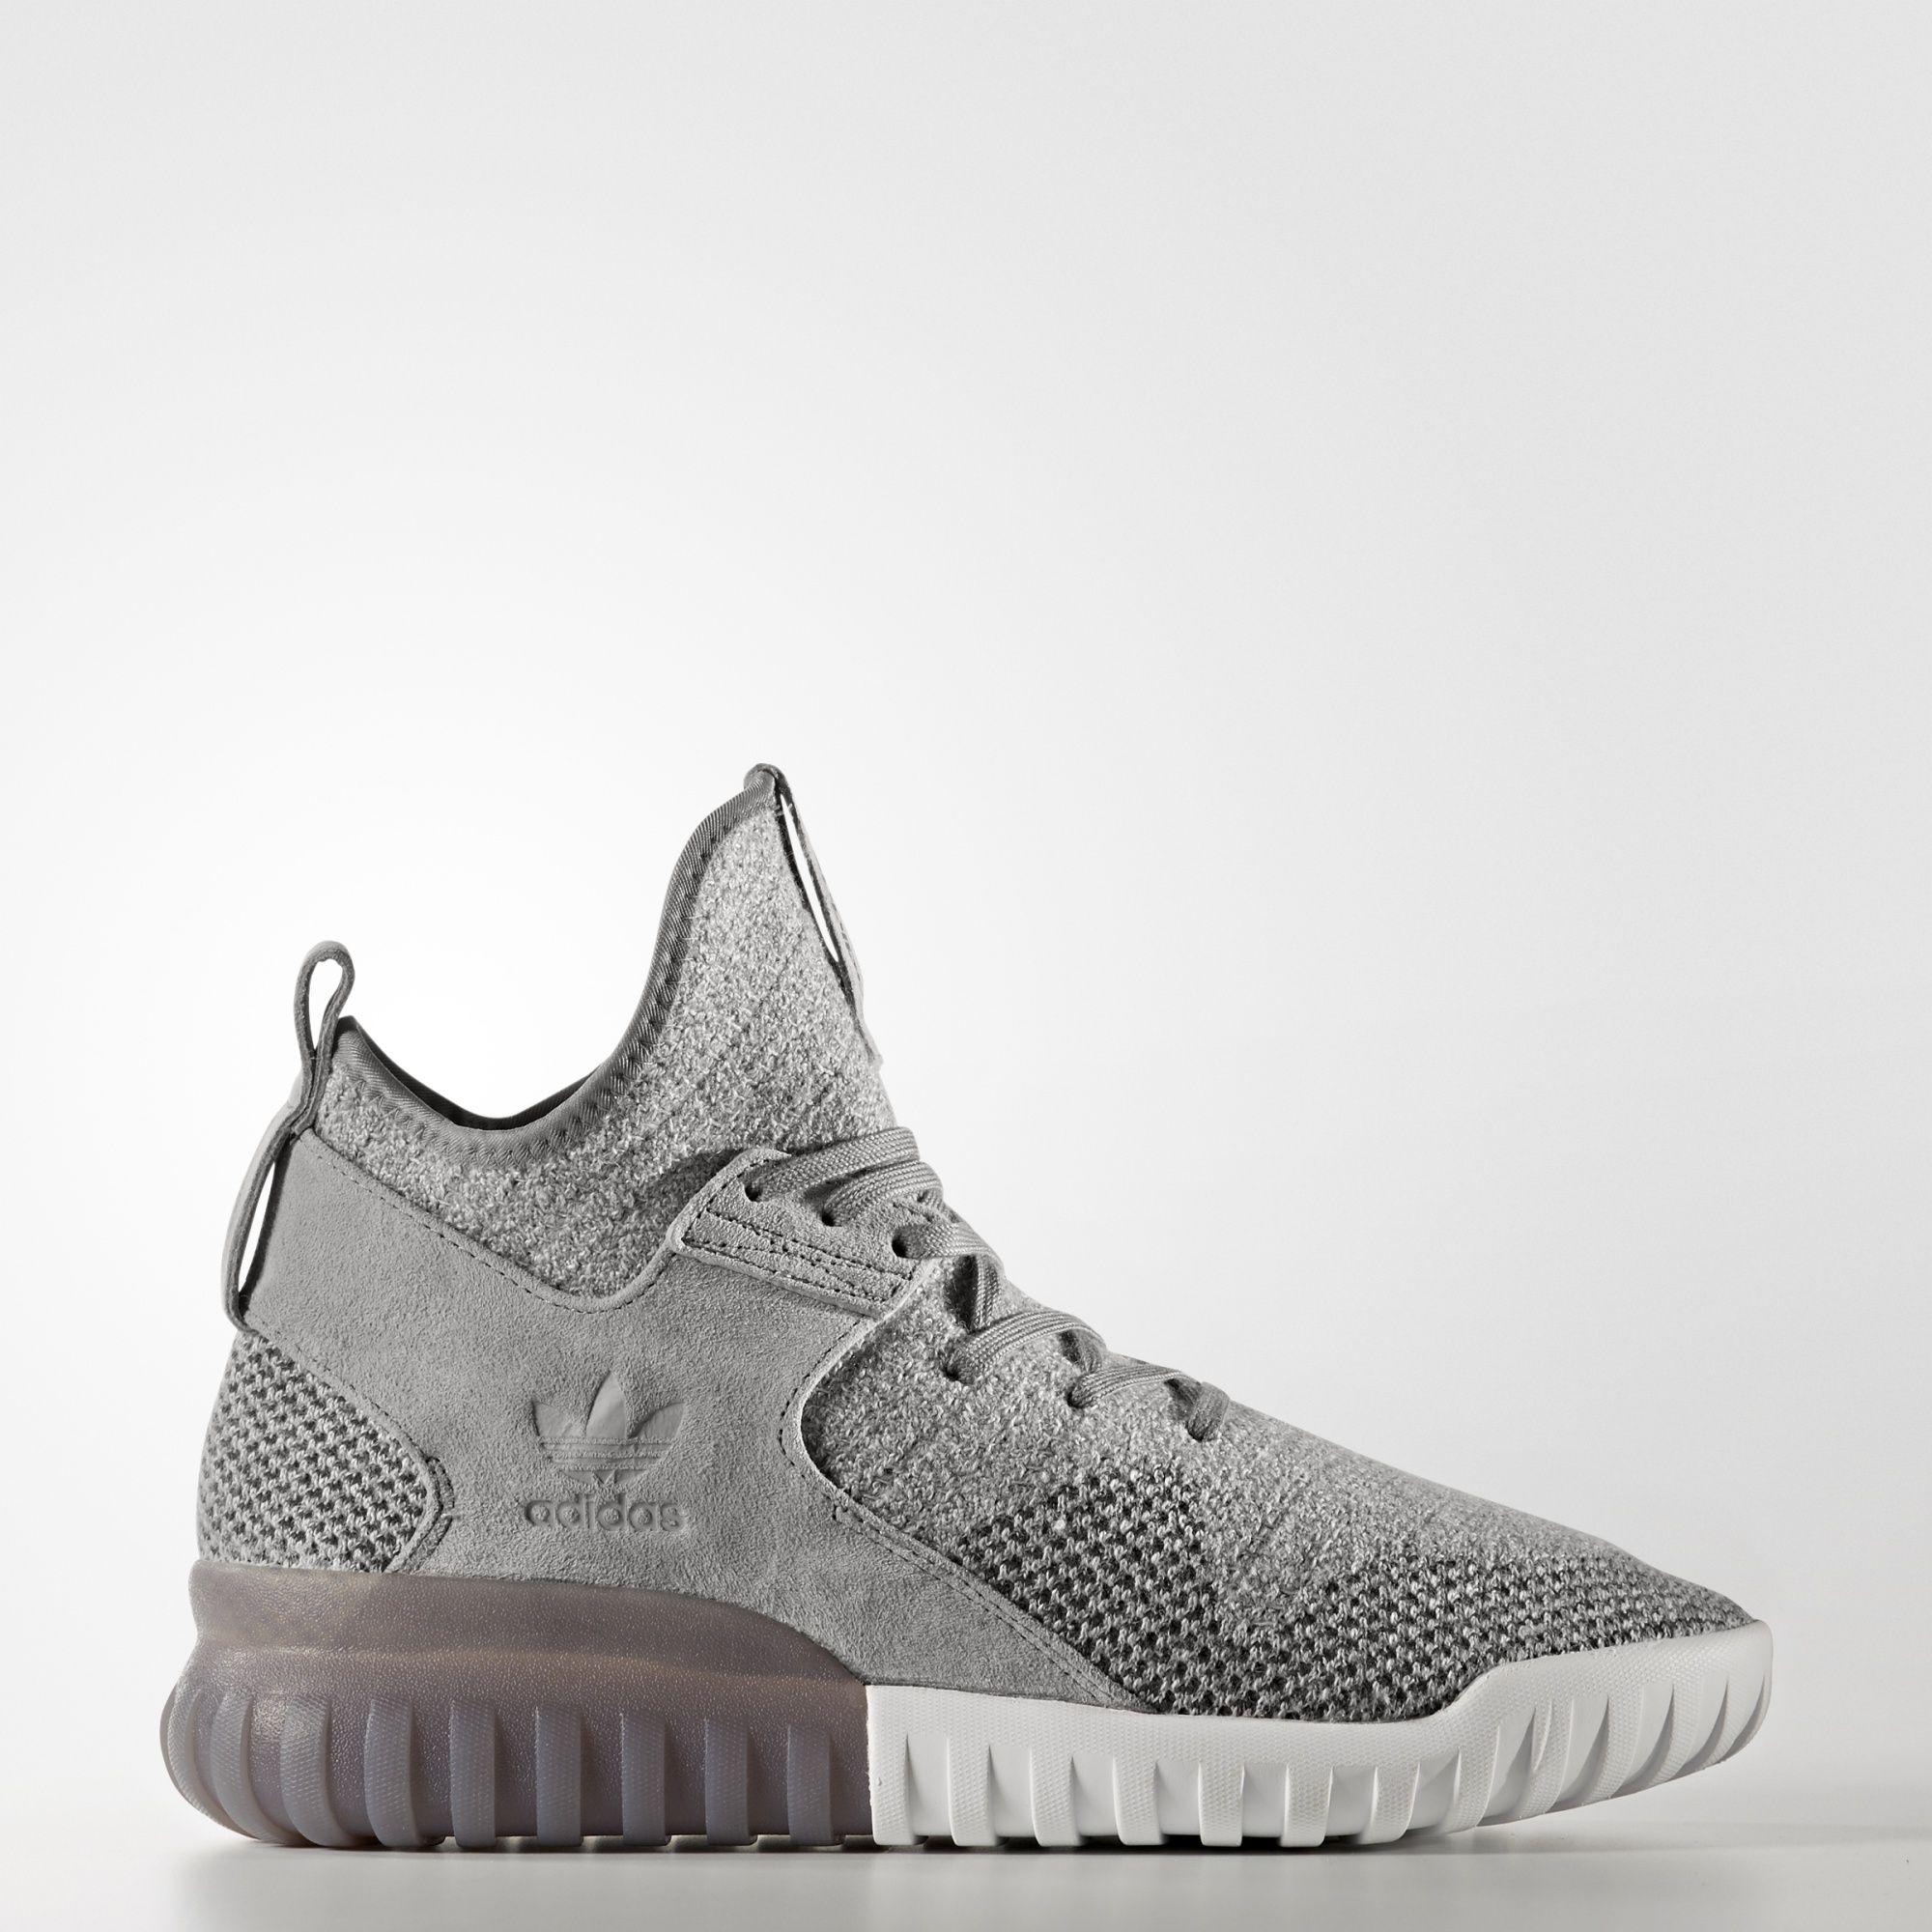 52ed60417d4  Adidas  BB2380 Tubular X PK Primeknit Men Women Running Shoes Sneakers Grey